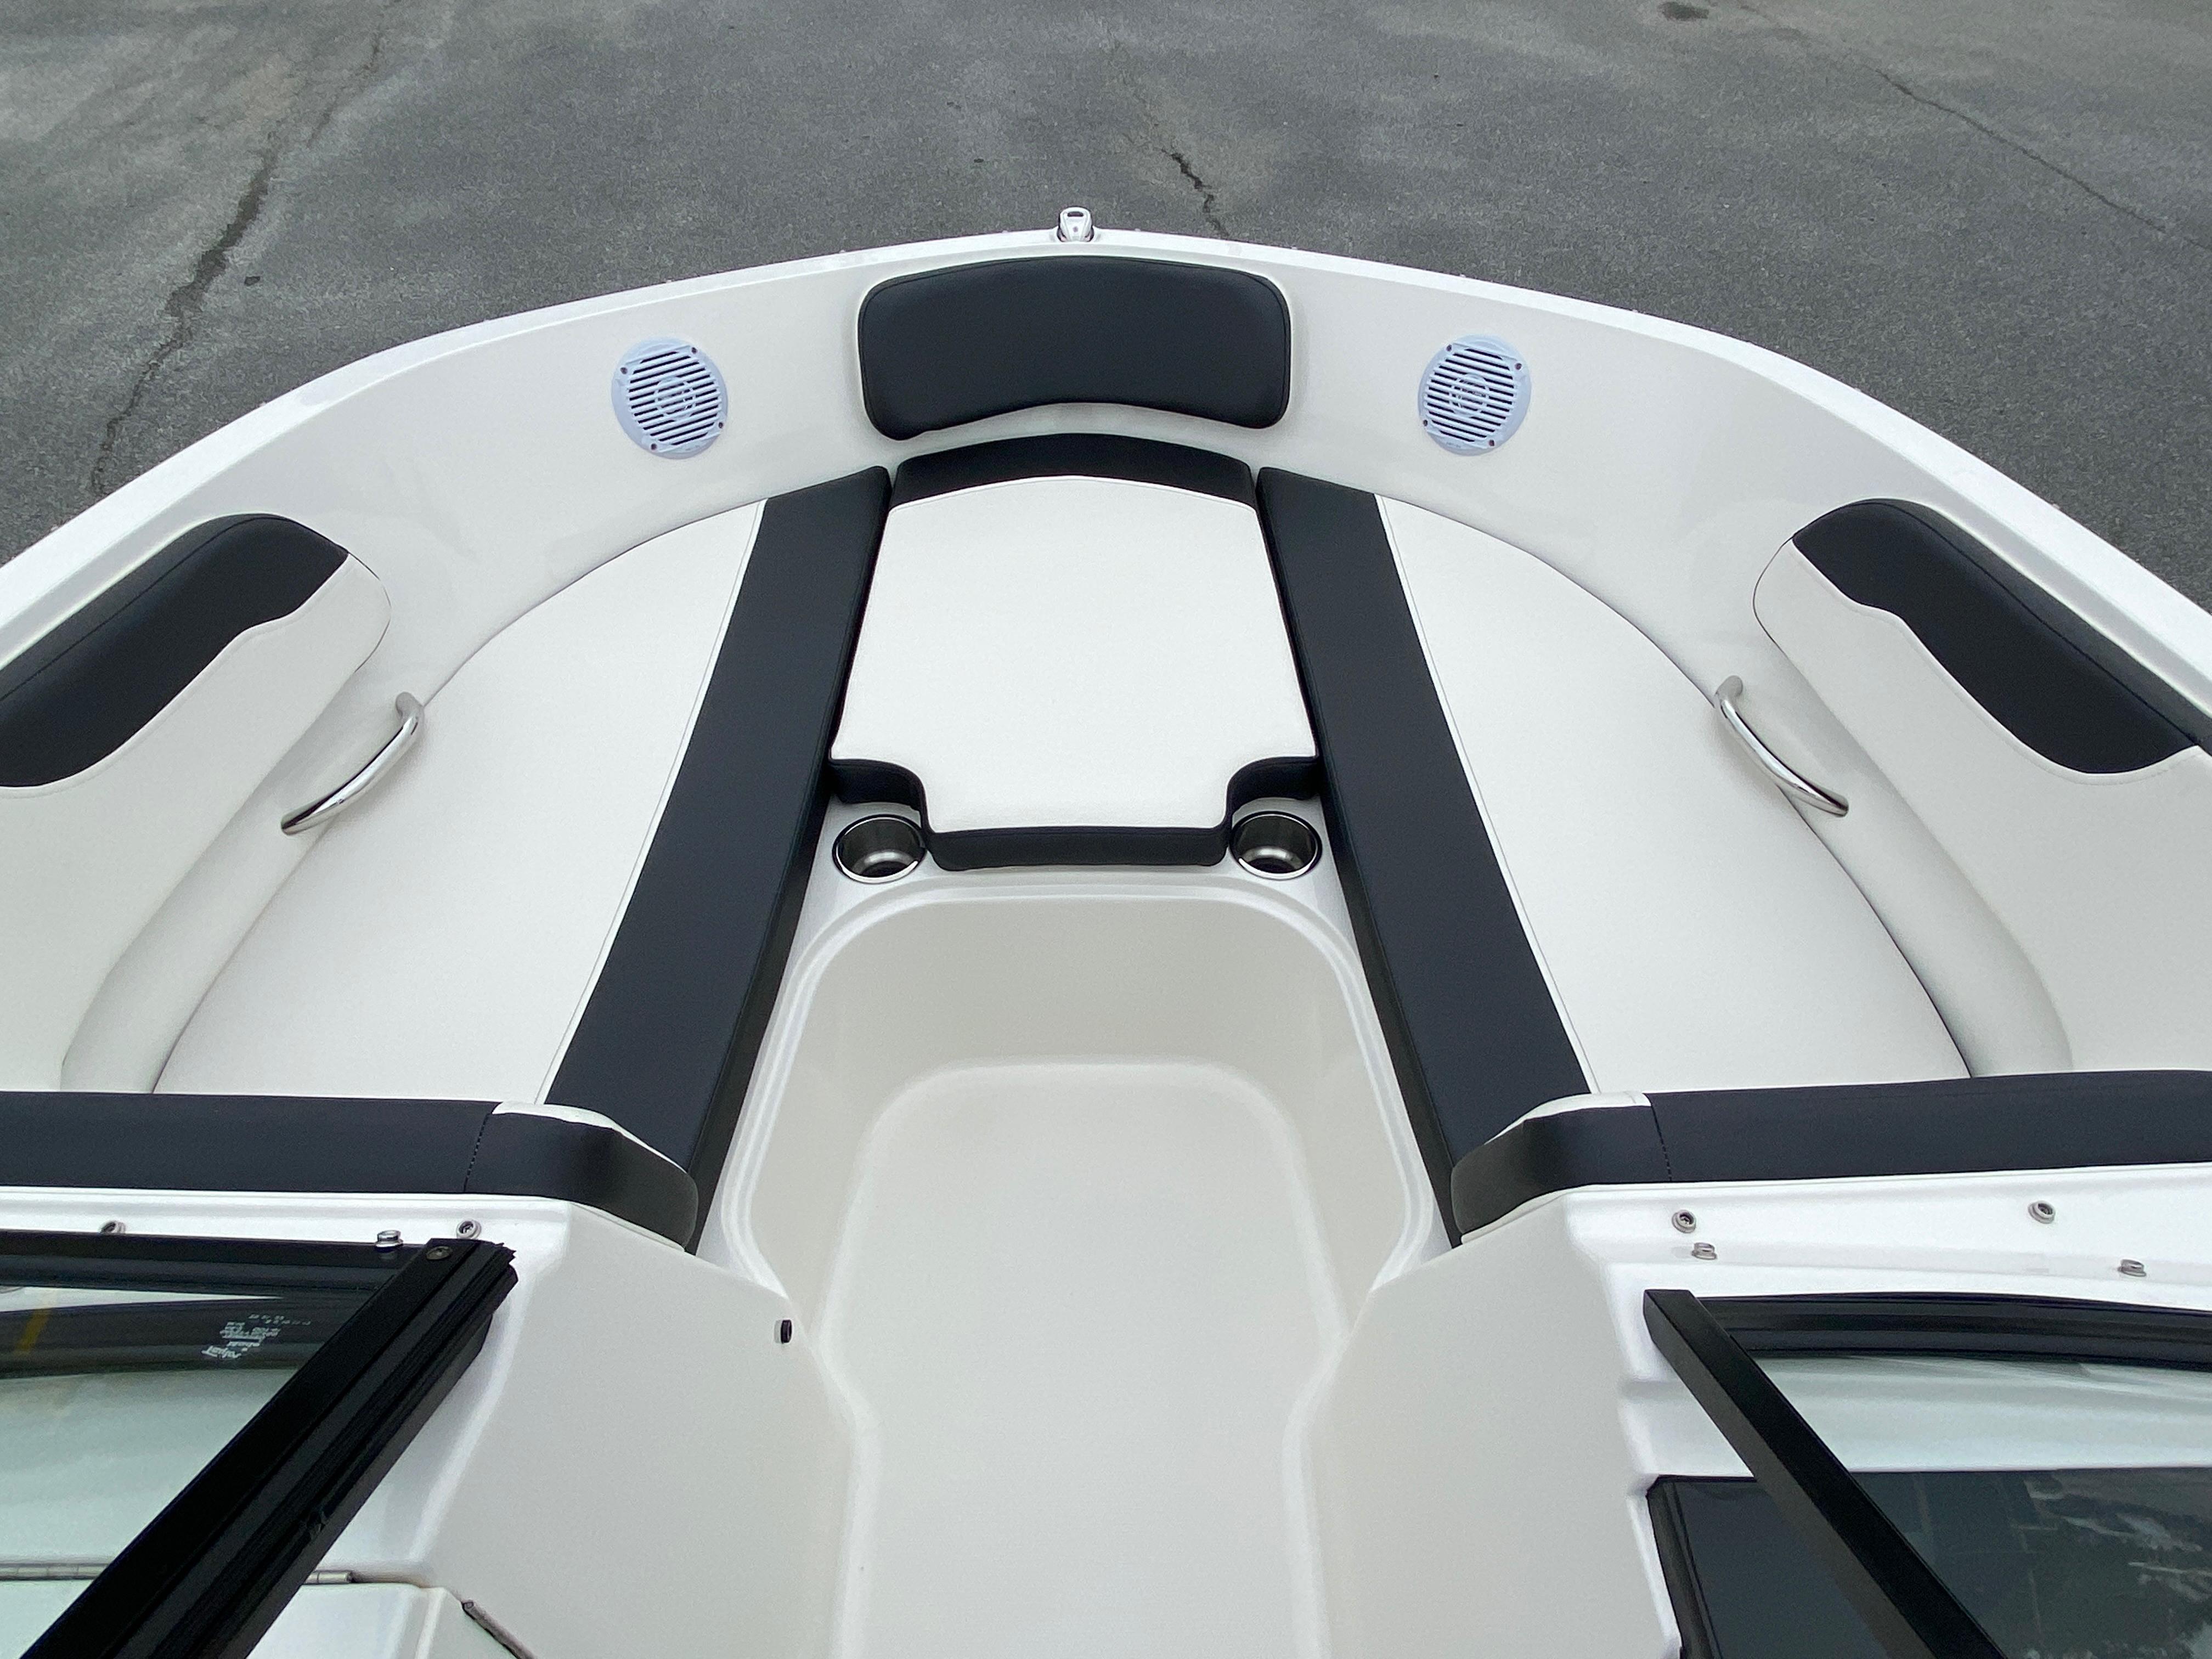 2020 Bayliner boat for sale, model of the boat is VR6 Bowrider & Image # 8 of 14